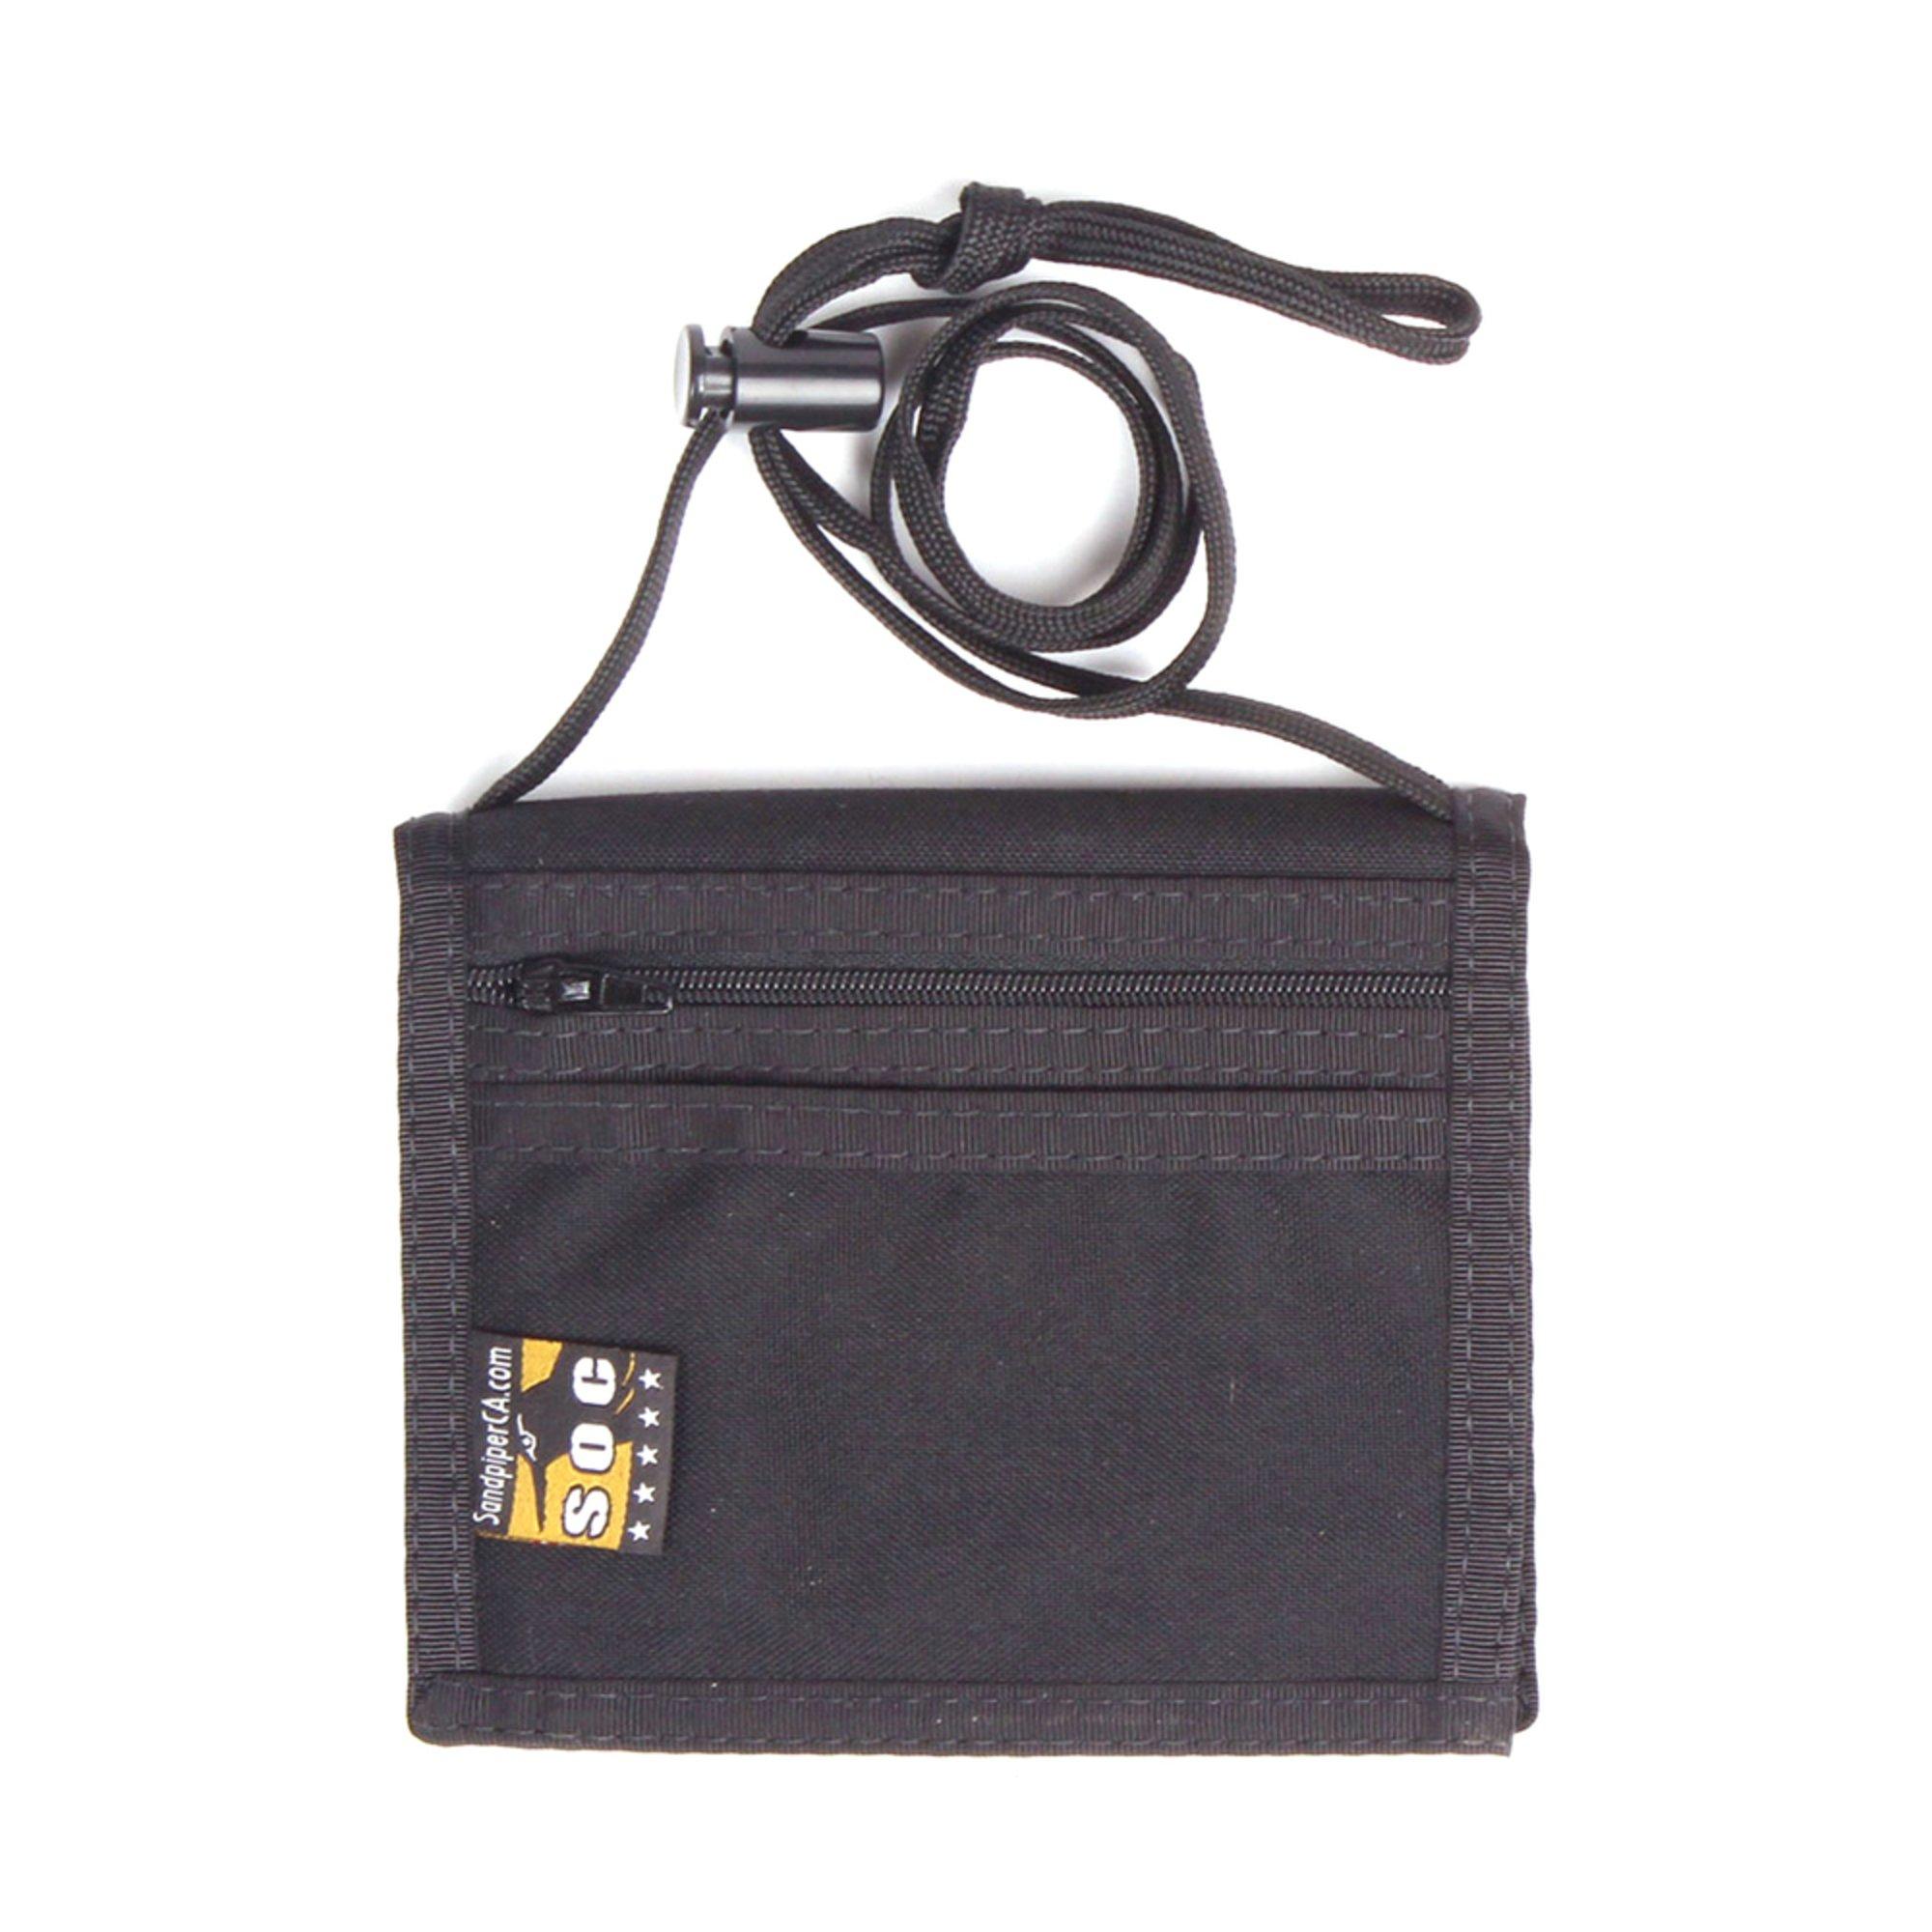 Sandpiper Of California Neck Bi-fold Id Wallet - Black